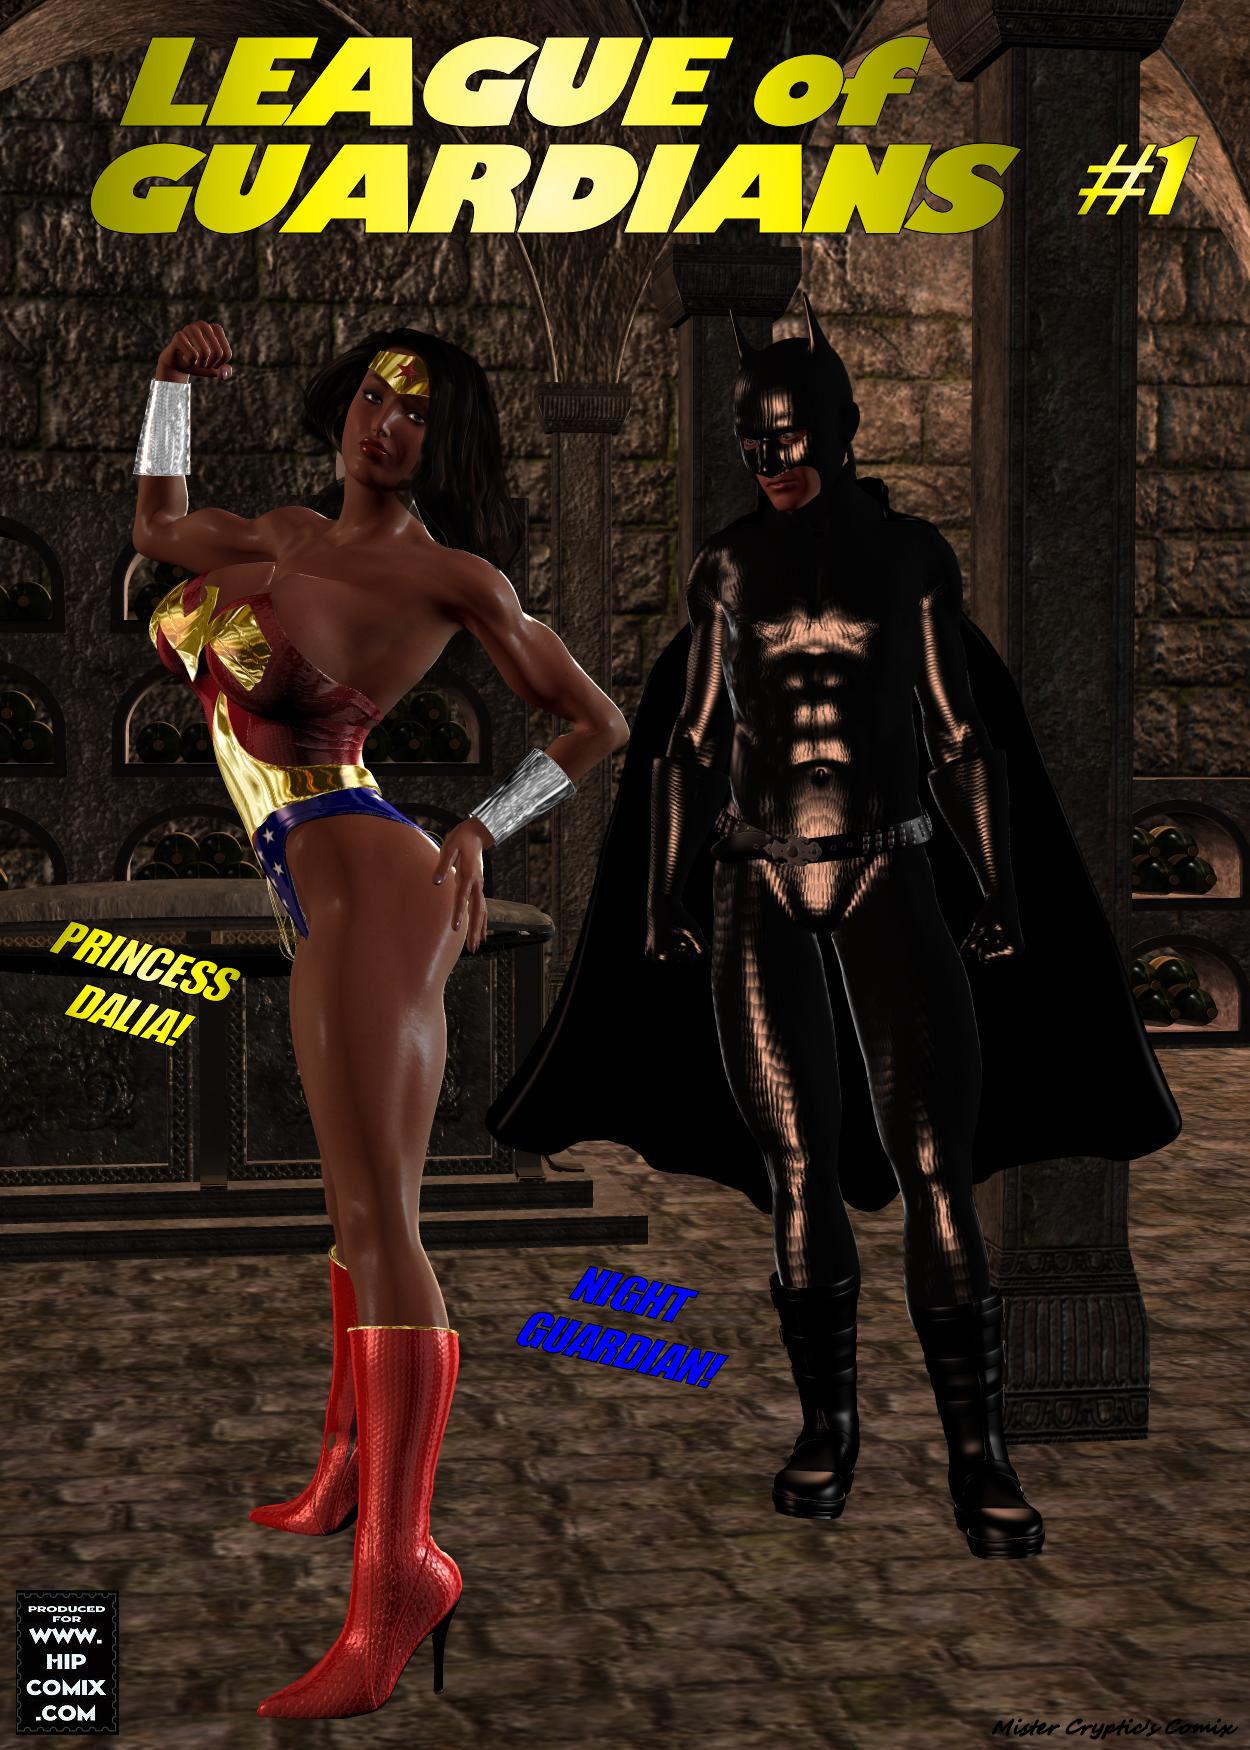 League of Guardians 1 & 2- Hip Comix porn comics 8 muses